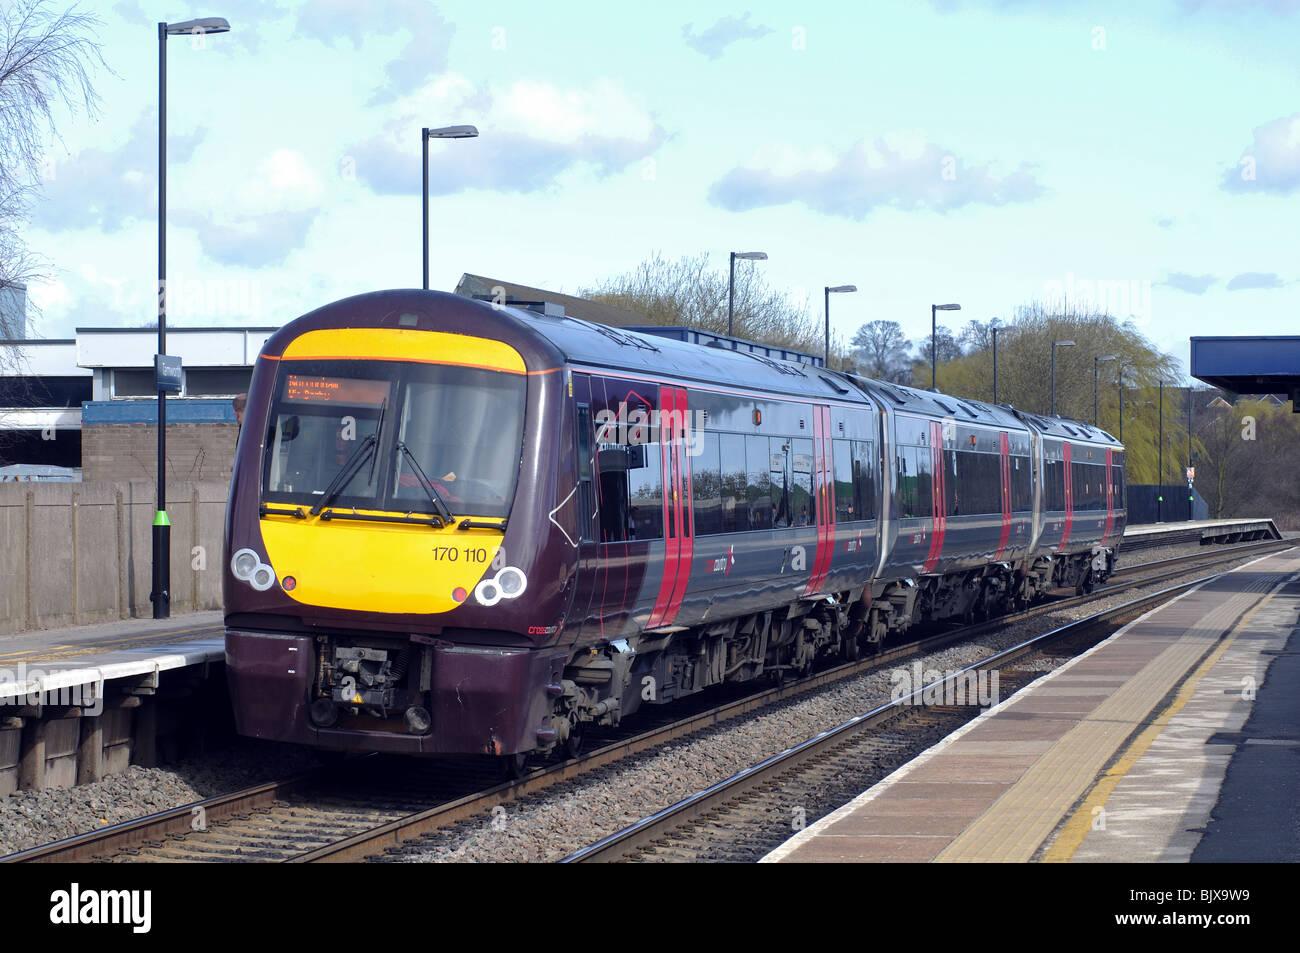 Arriva Cross Country train at Tamworth station, Staffordshire, England, UK - Stock Image